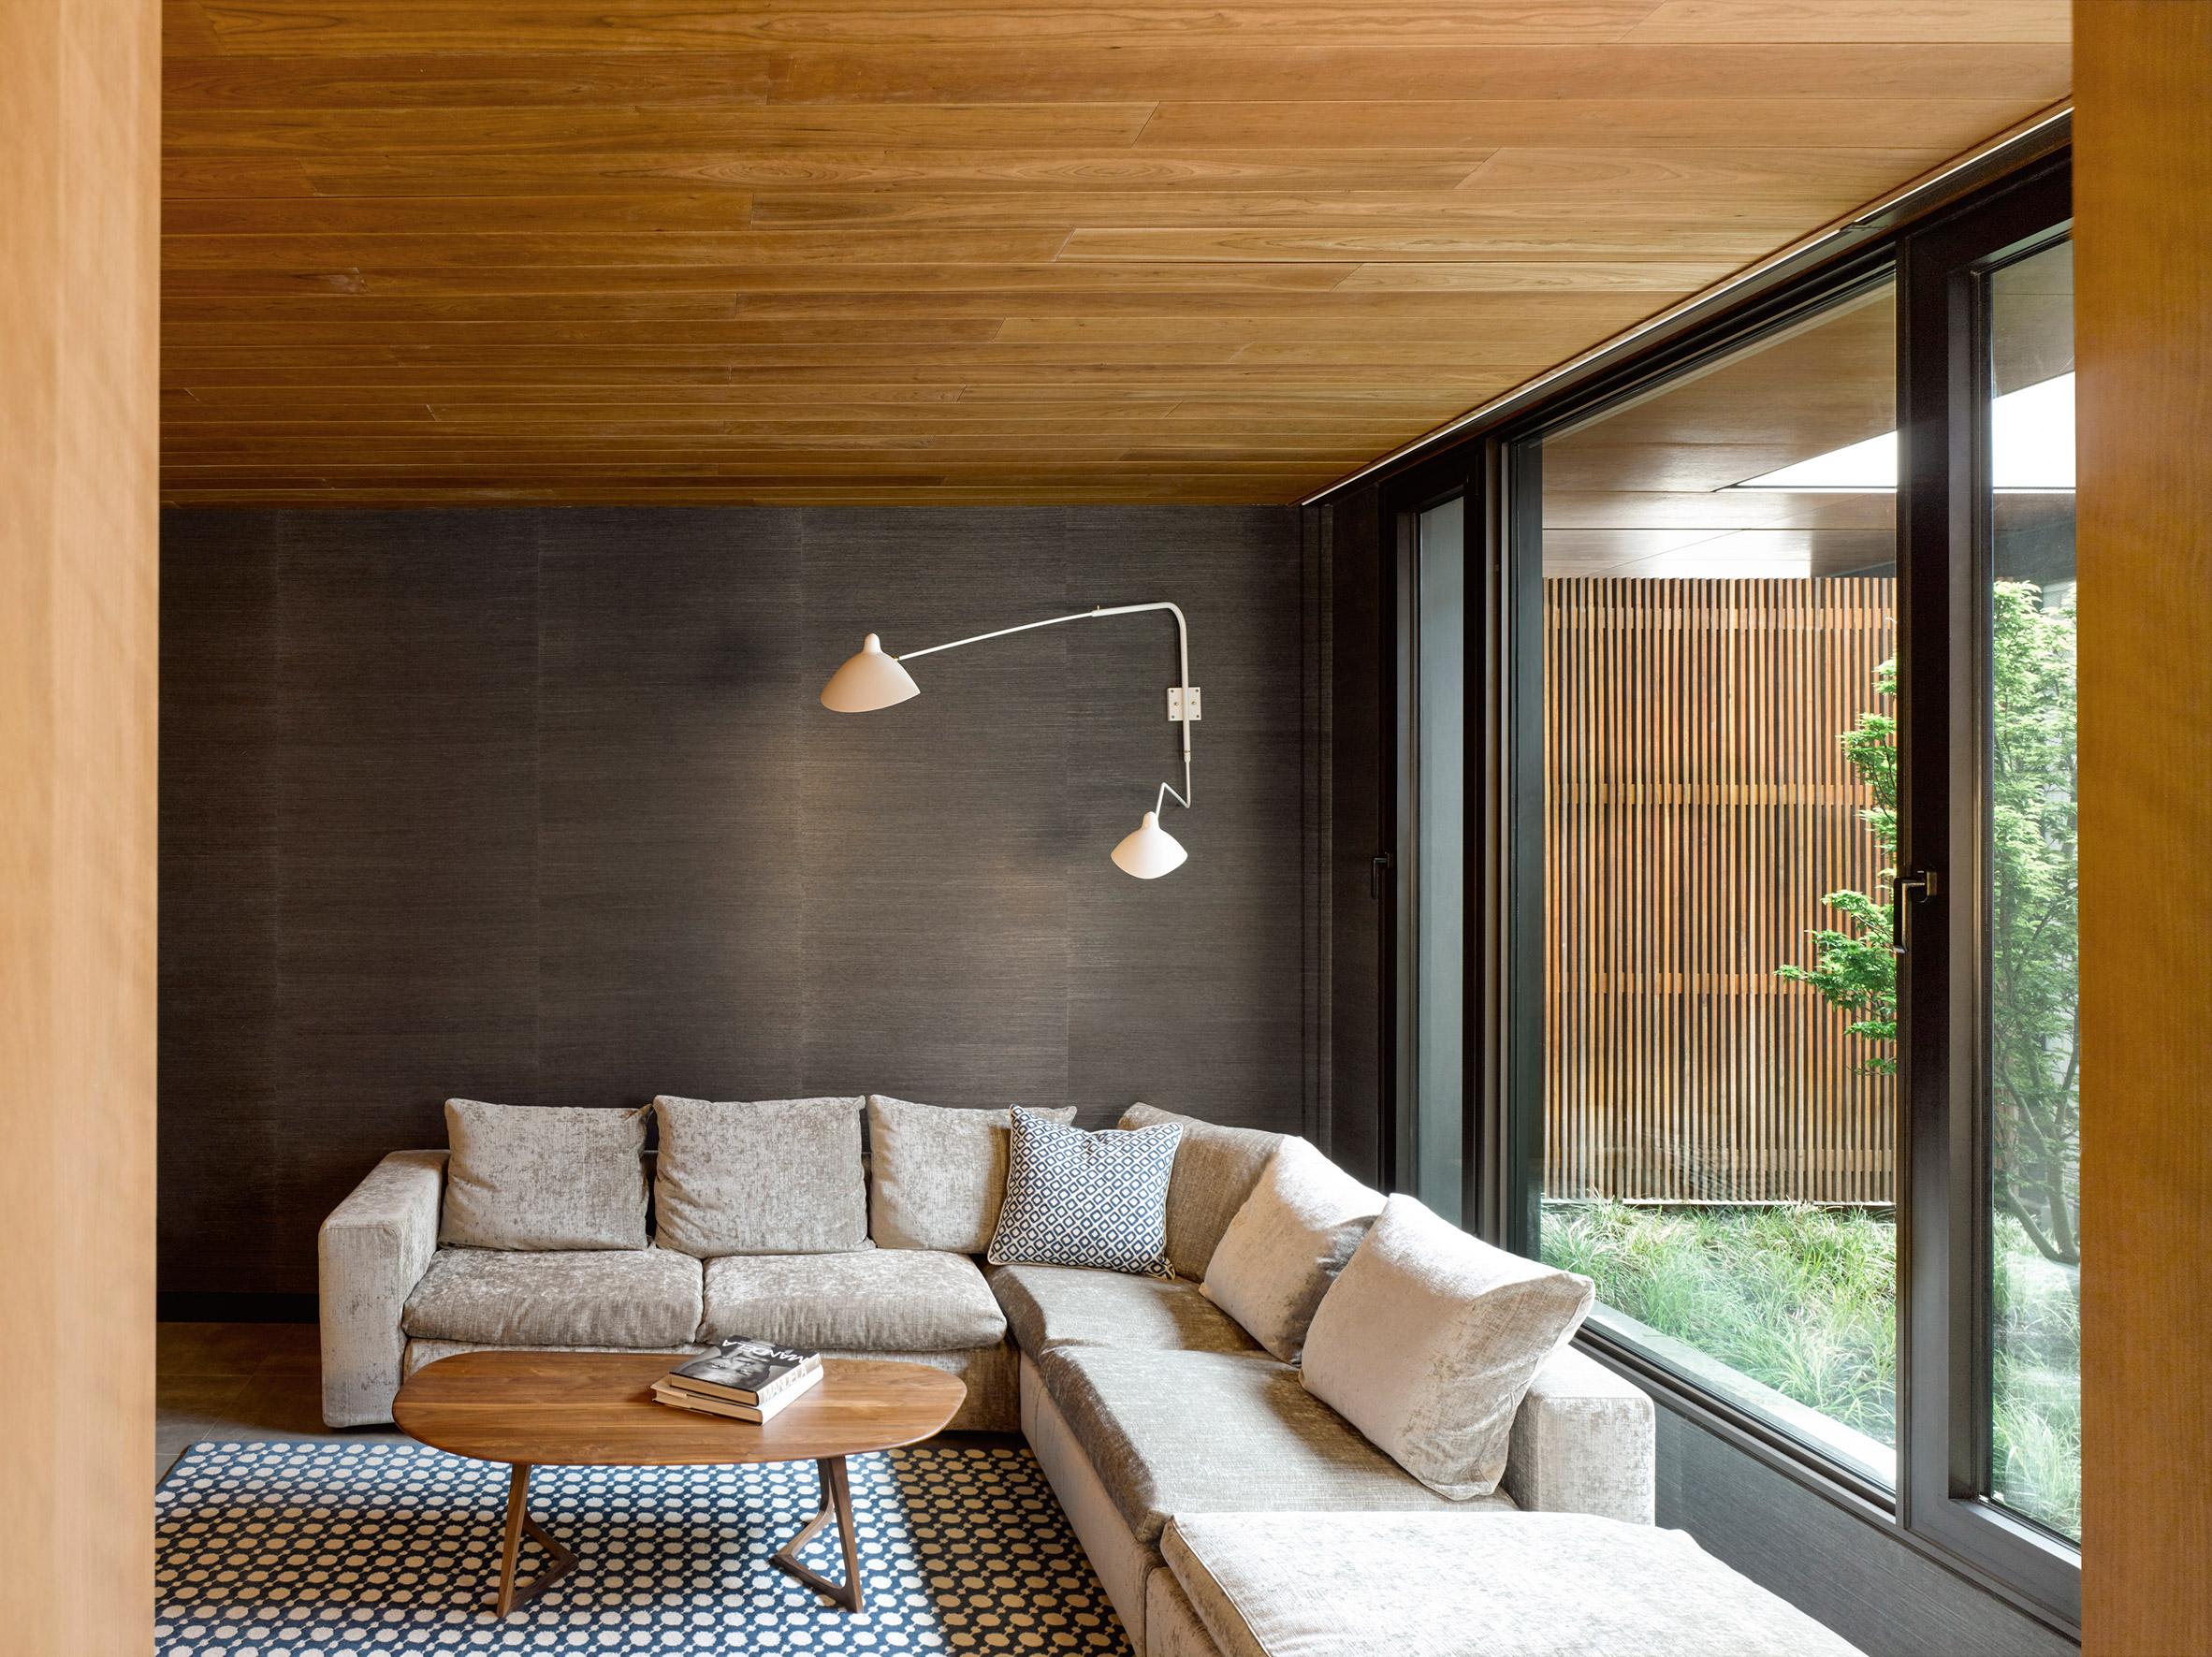 Mid century modern update midcentury bedroom tampa by - Midcentury Beauty Gets Sleek Refresh And Update Curbed